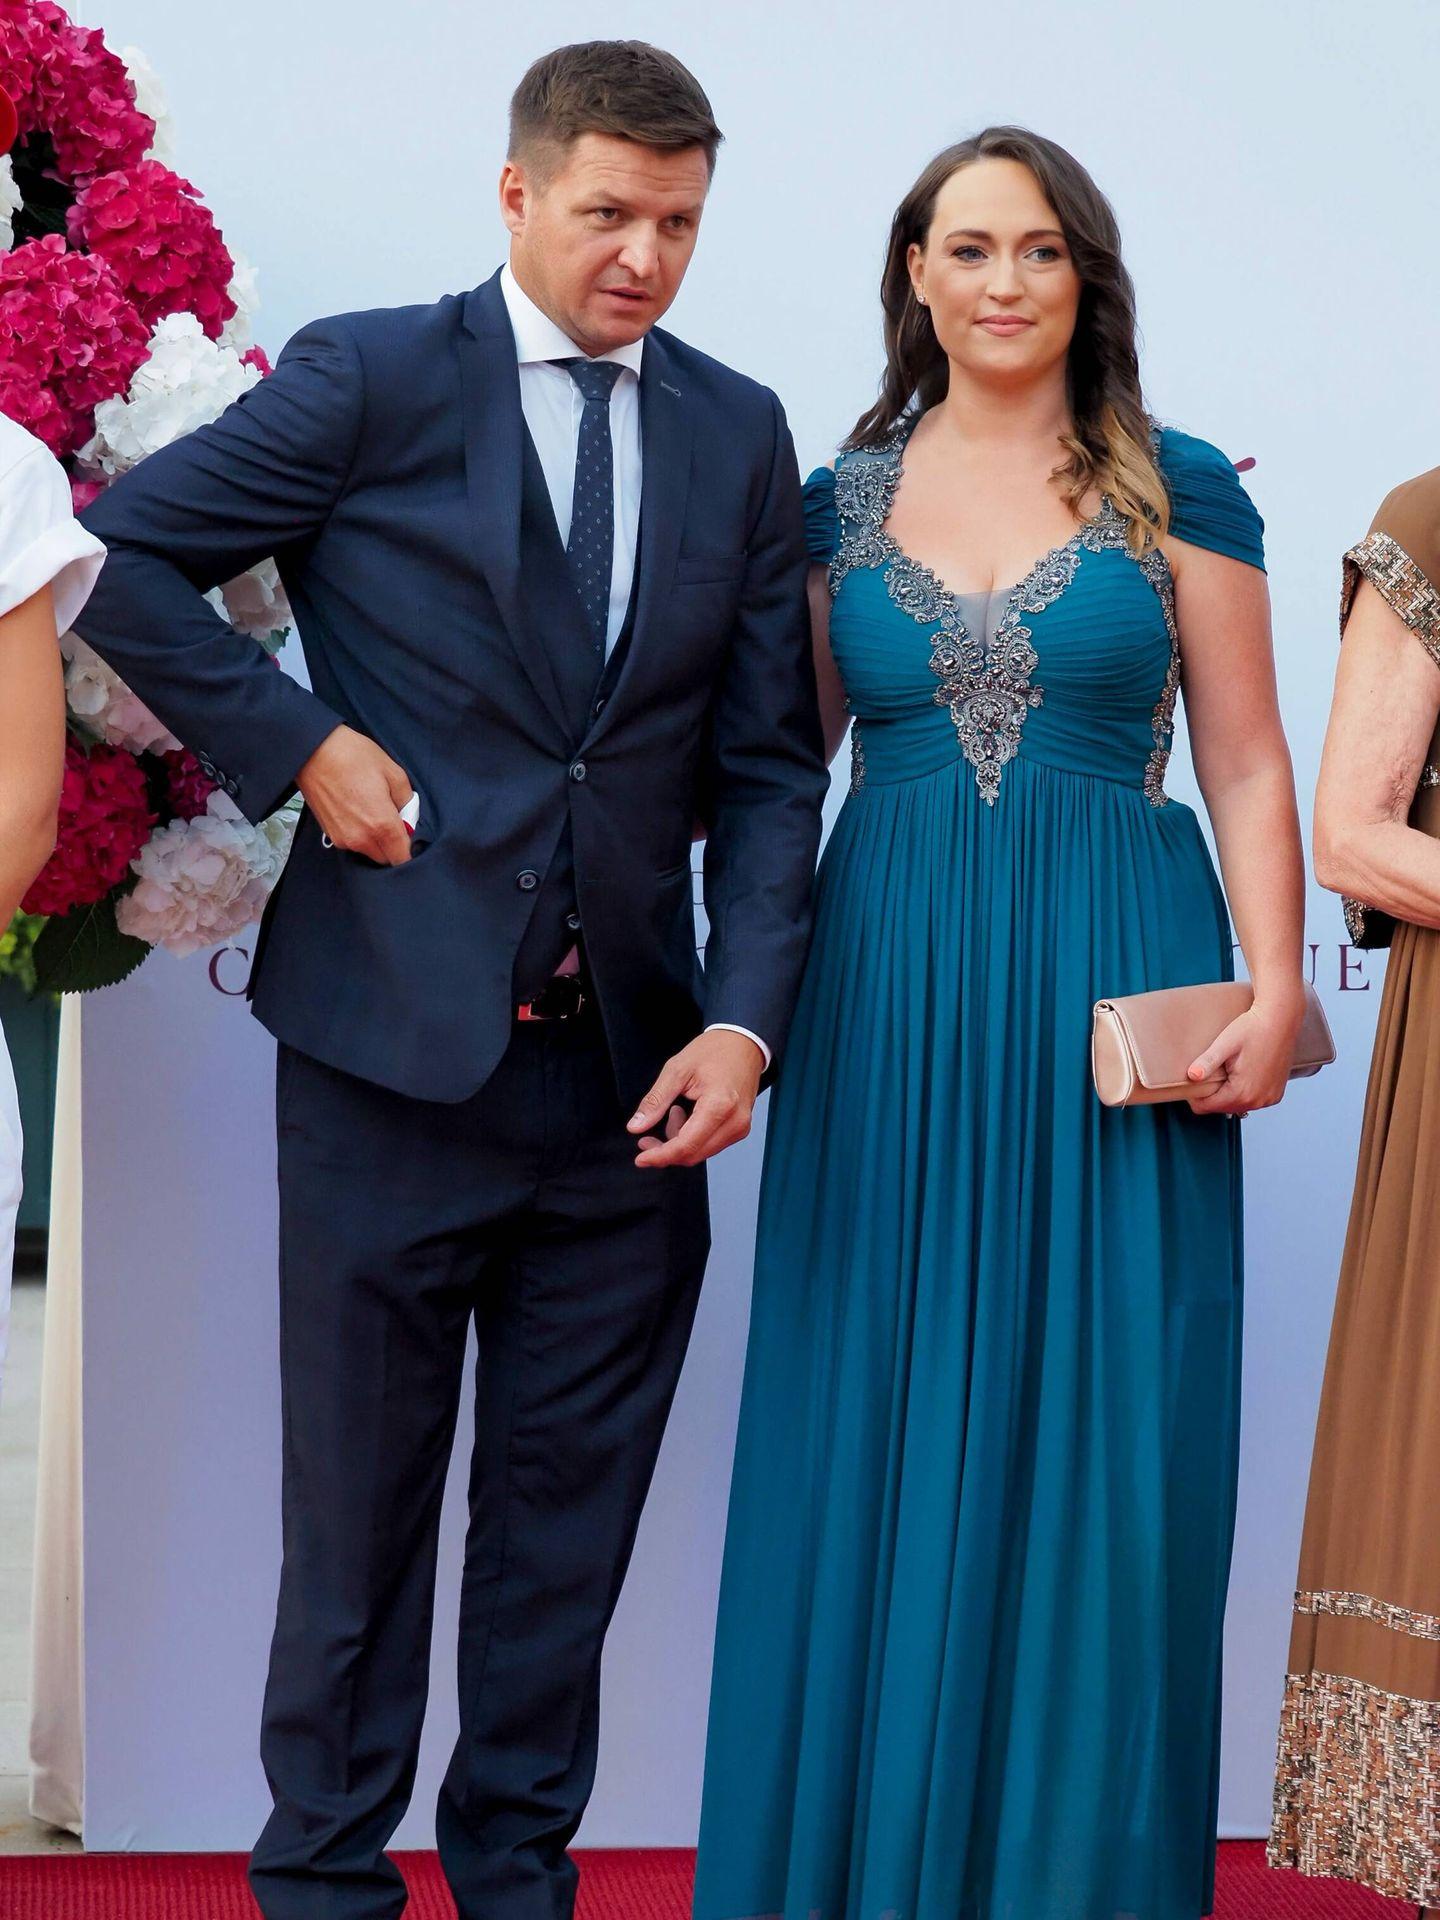 El hermano de Charlène, Gareth Wittstock y su esposa, Roisin Wittstock. (CP)